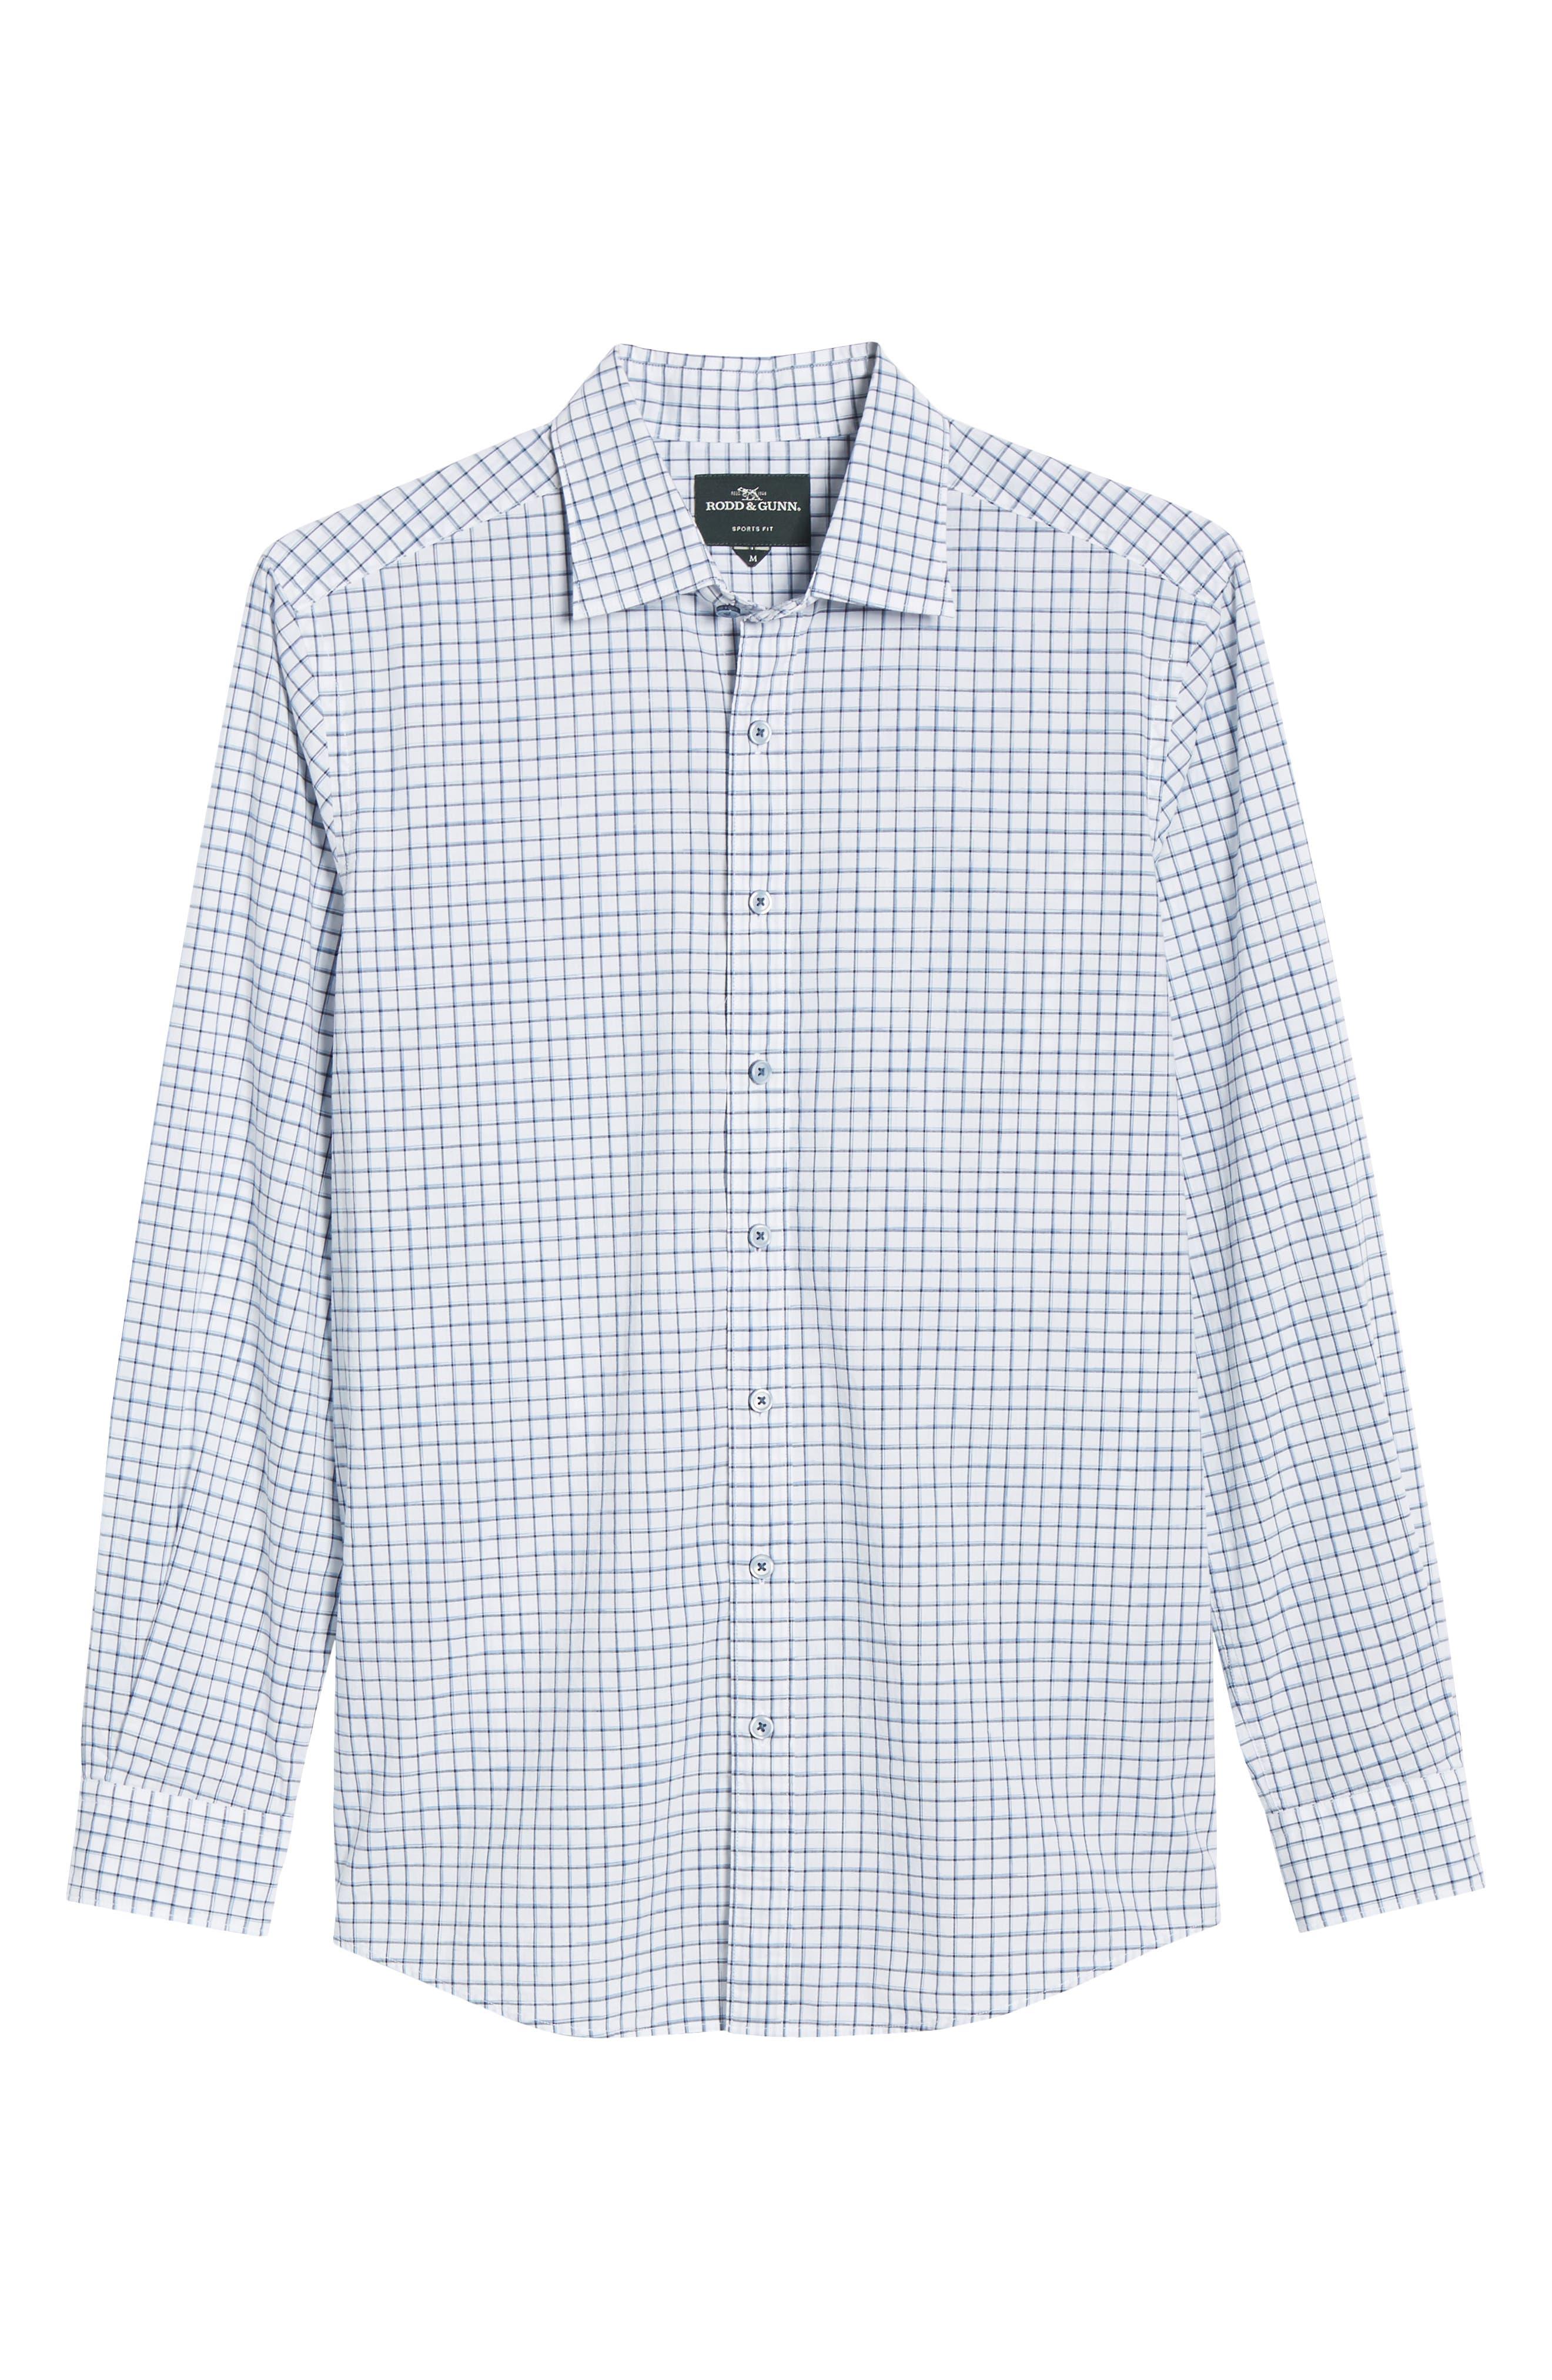 RODD & GUNN, Gowerville Regular Fit Check Sport Shirt, Alternate thumbnail 5, color, SNOW